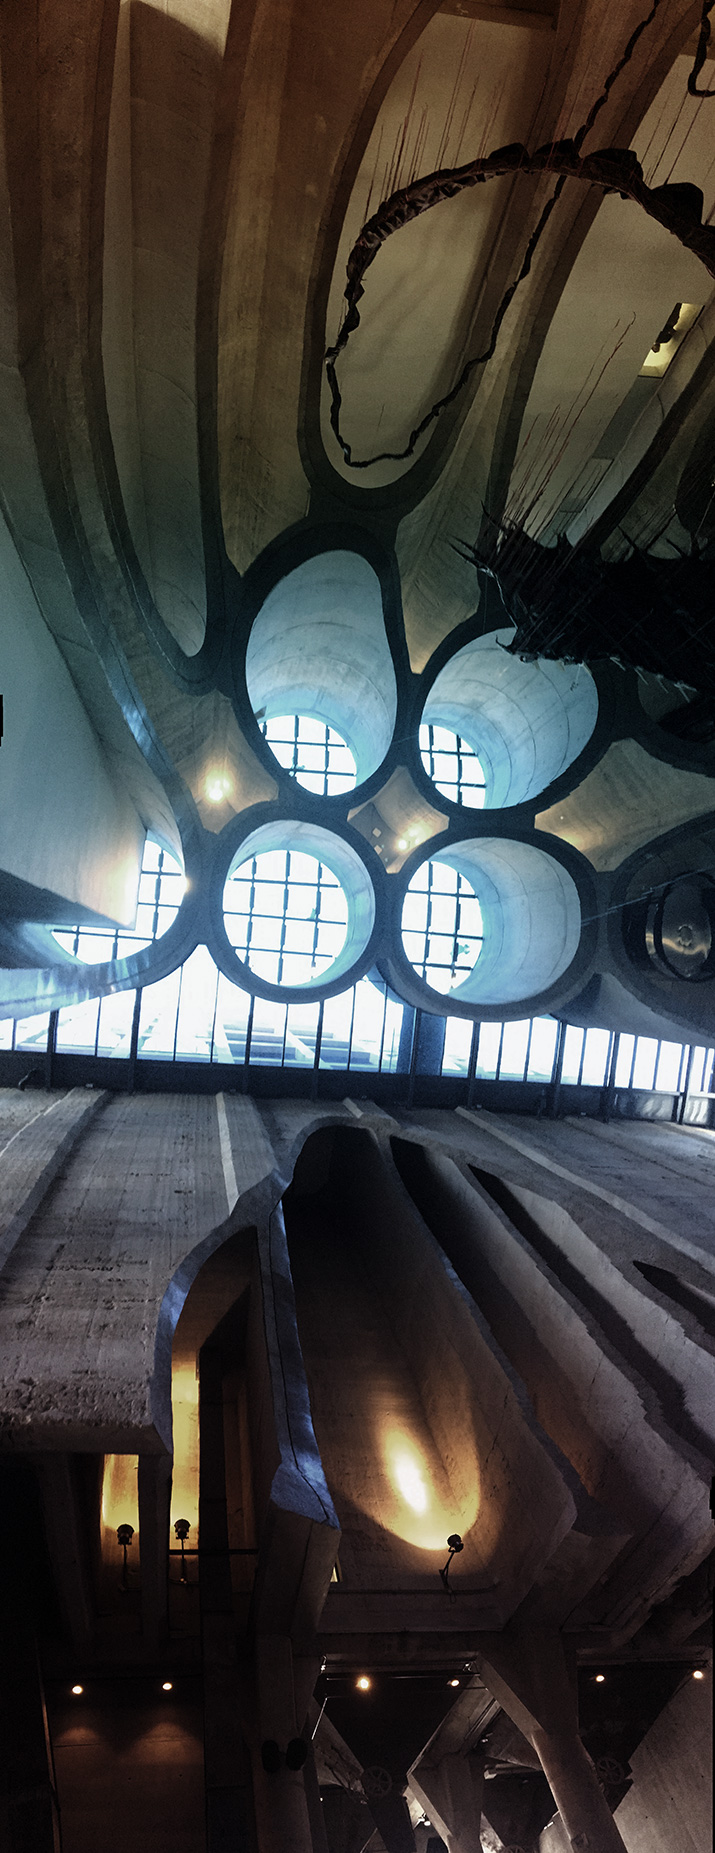 Zeitz Mocaa - The atrium which features the grain silo tubes